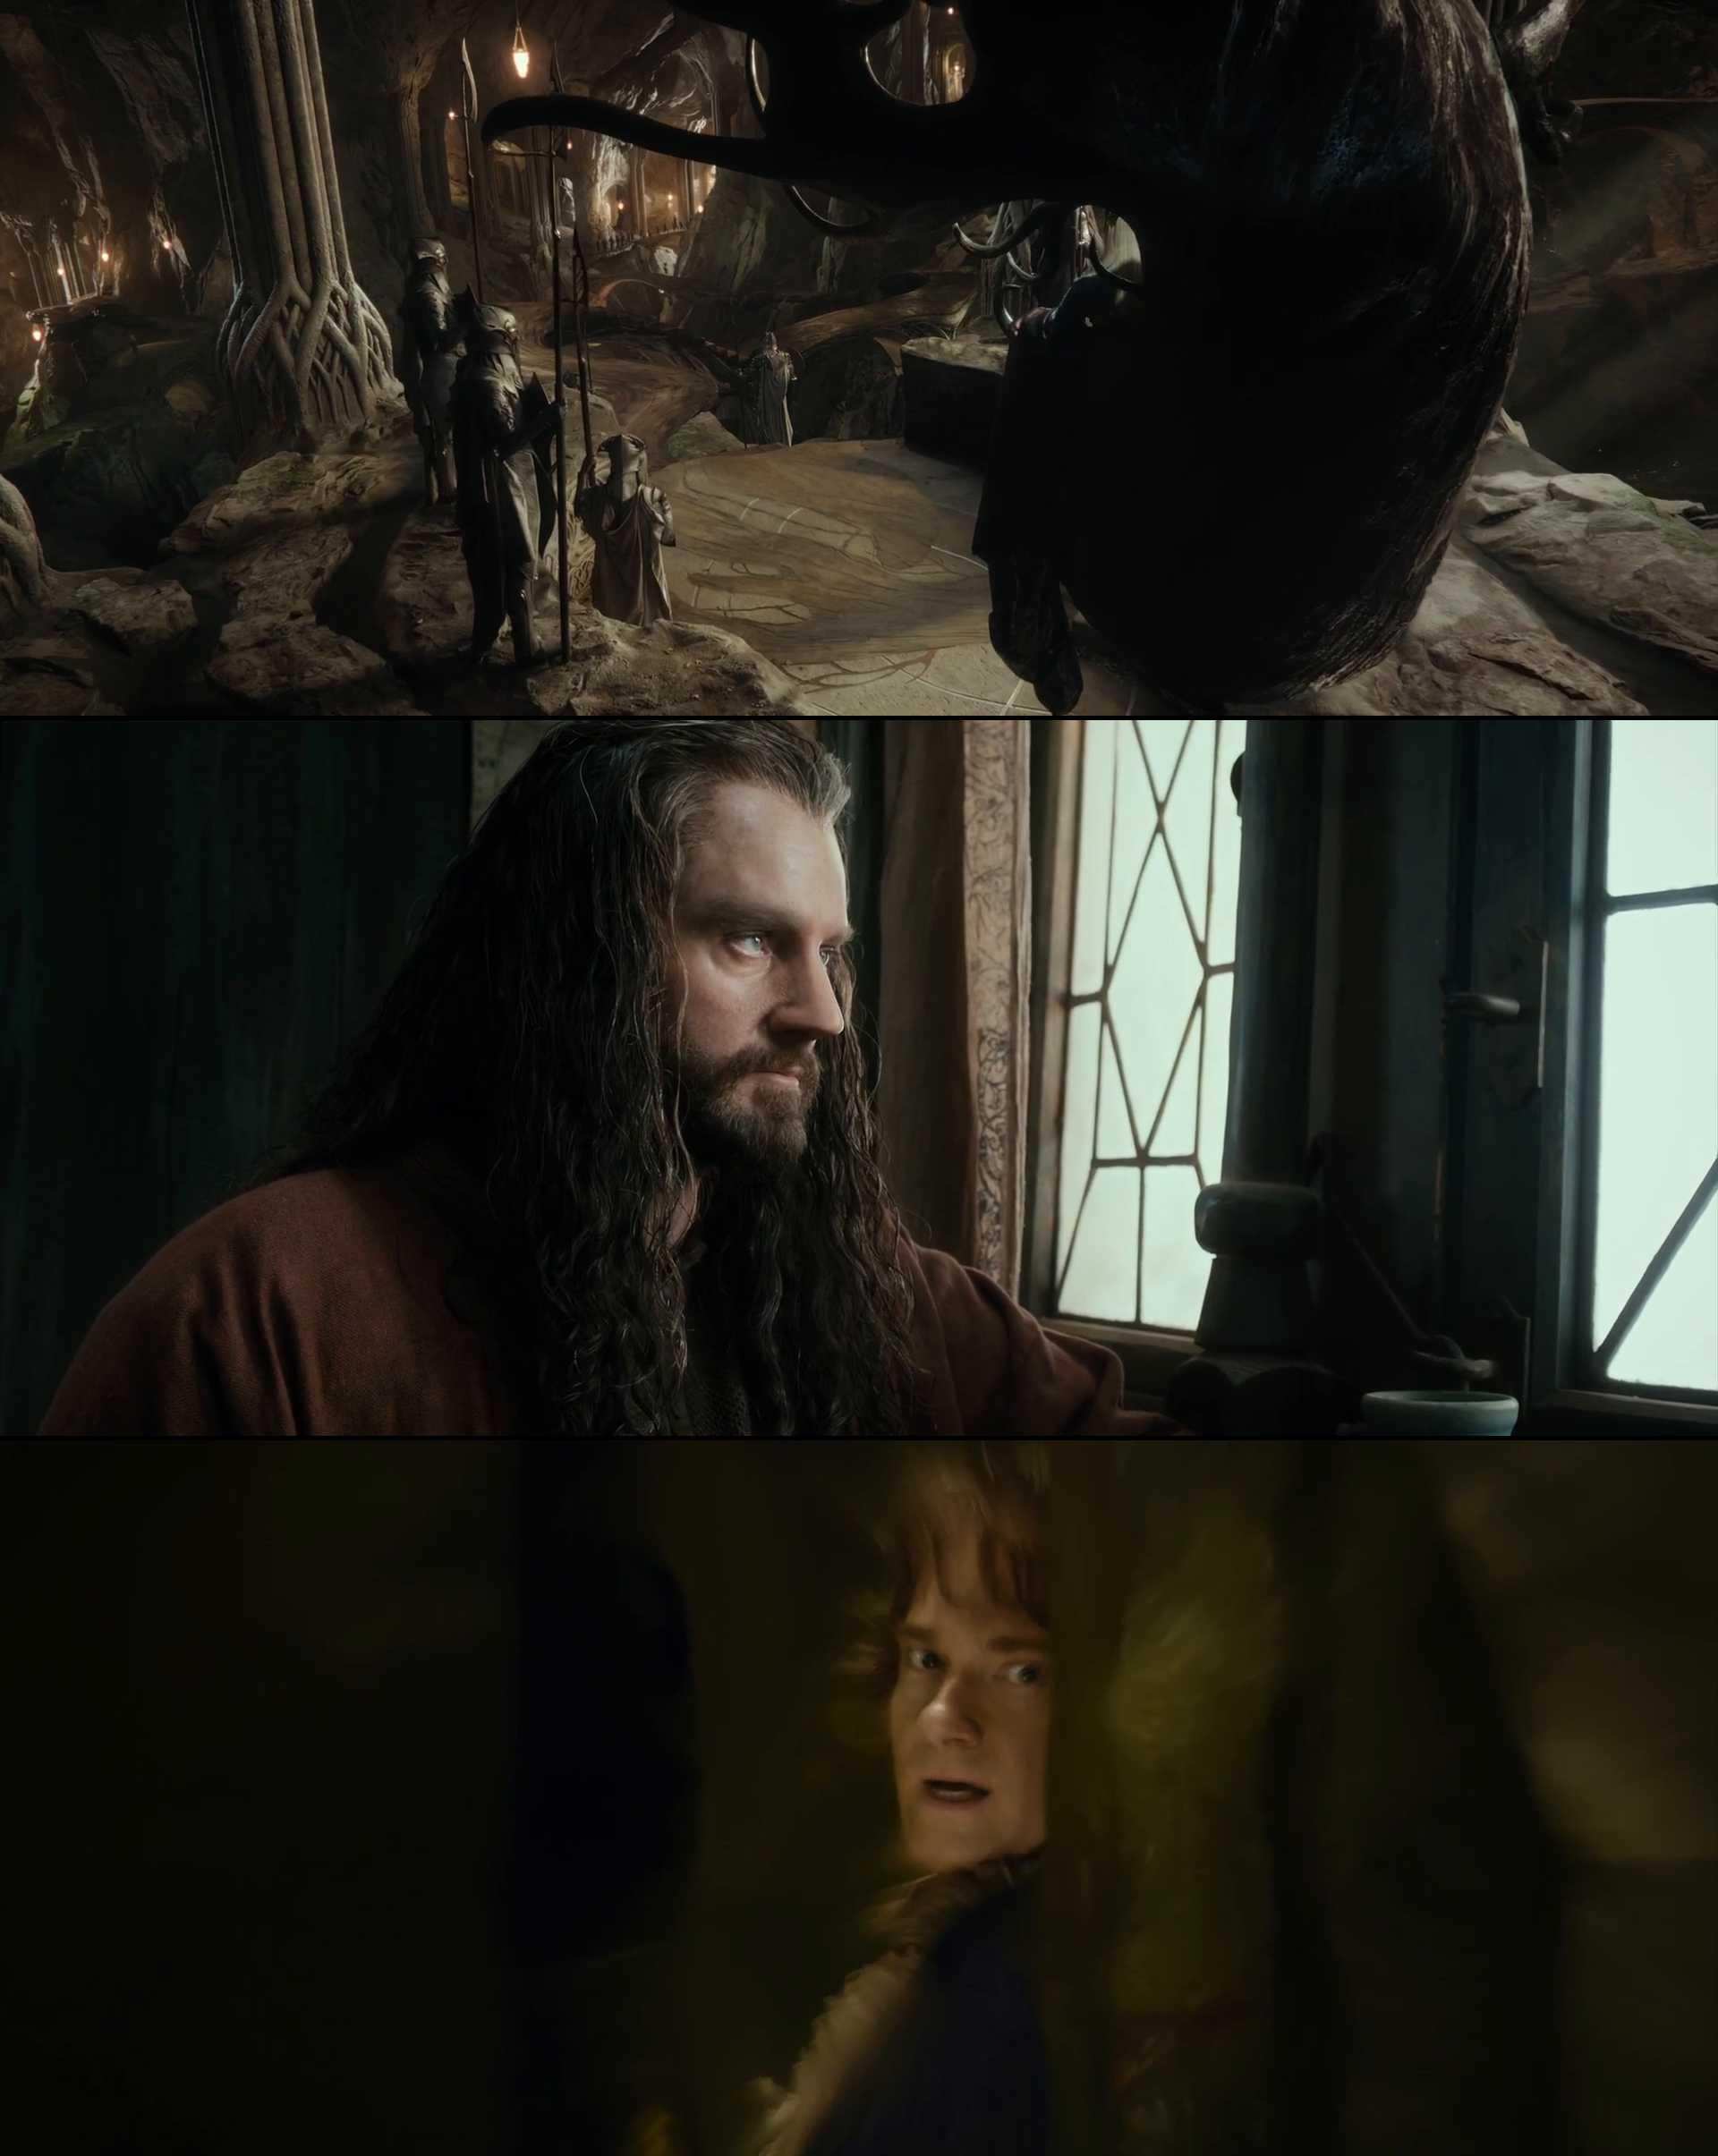 Screenshot of The Hobbit: The Desolation of Smaug